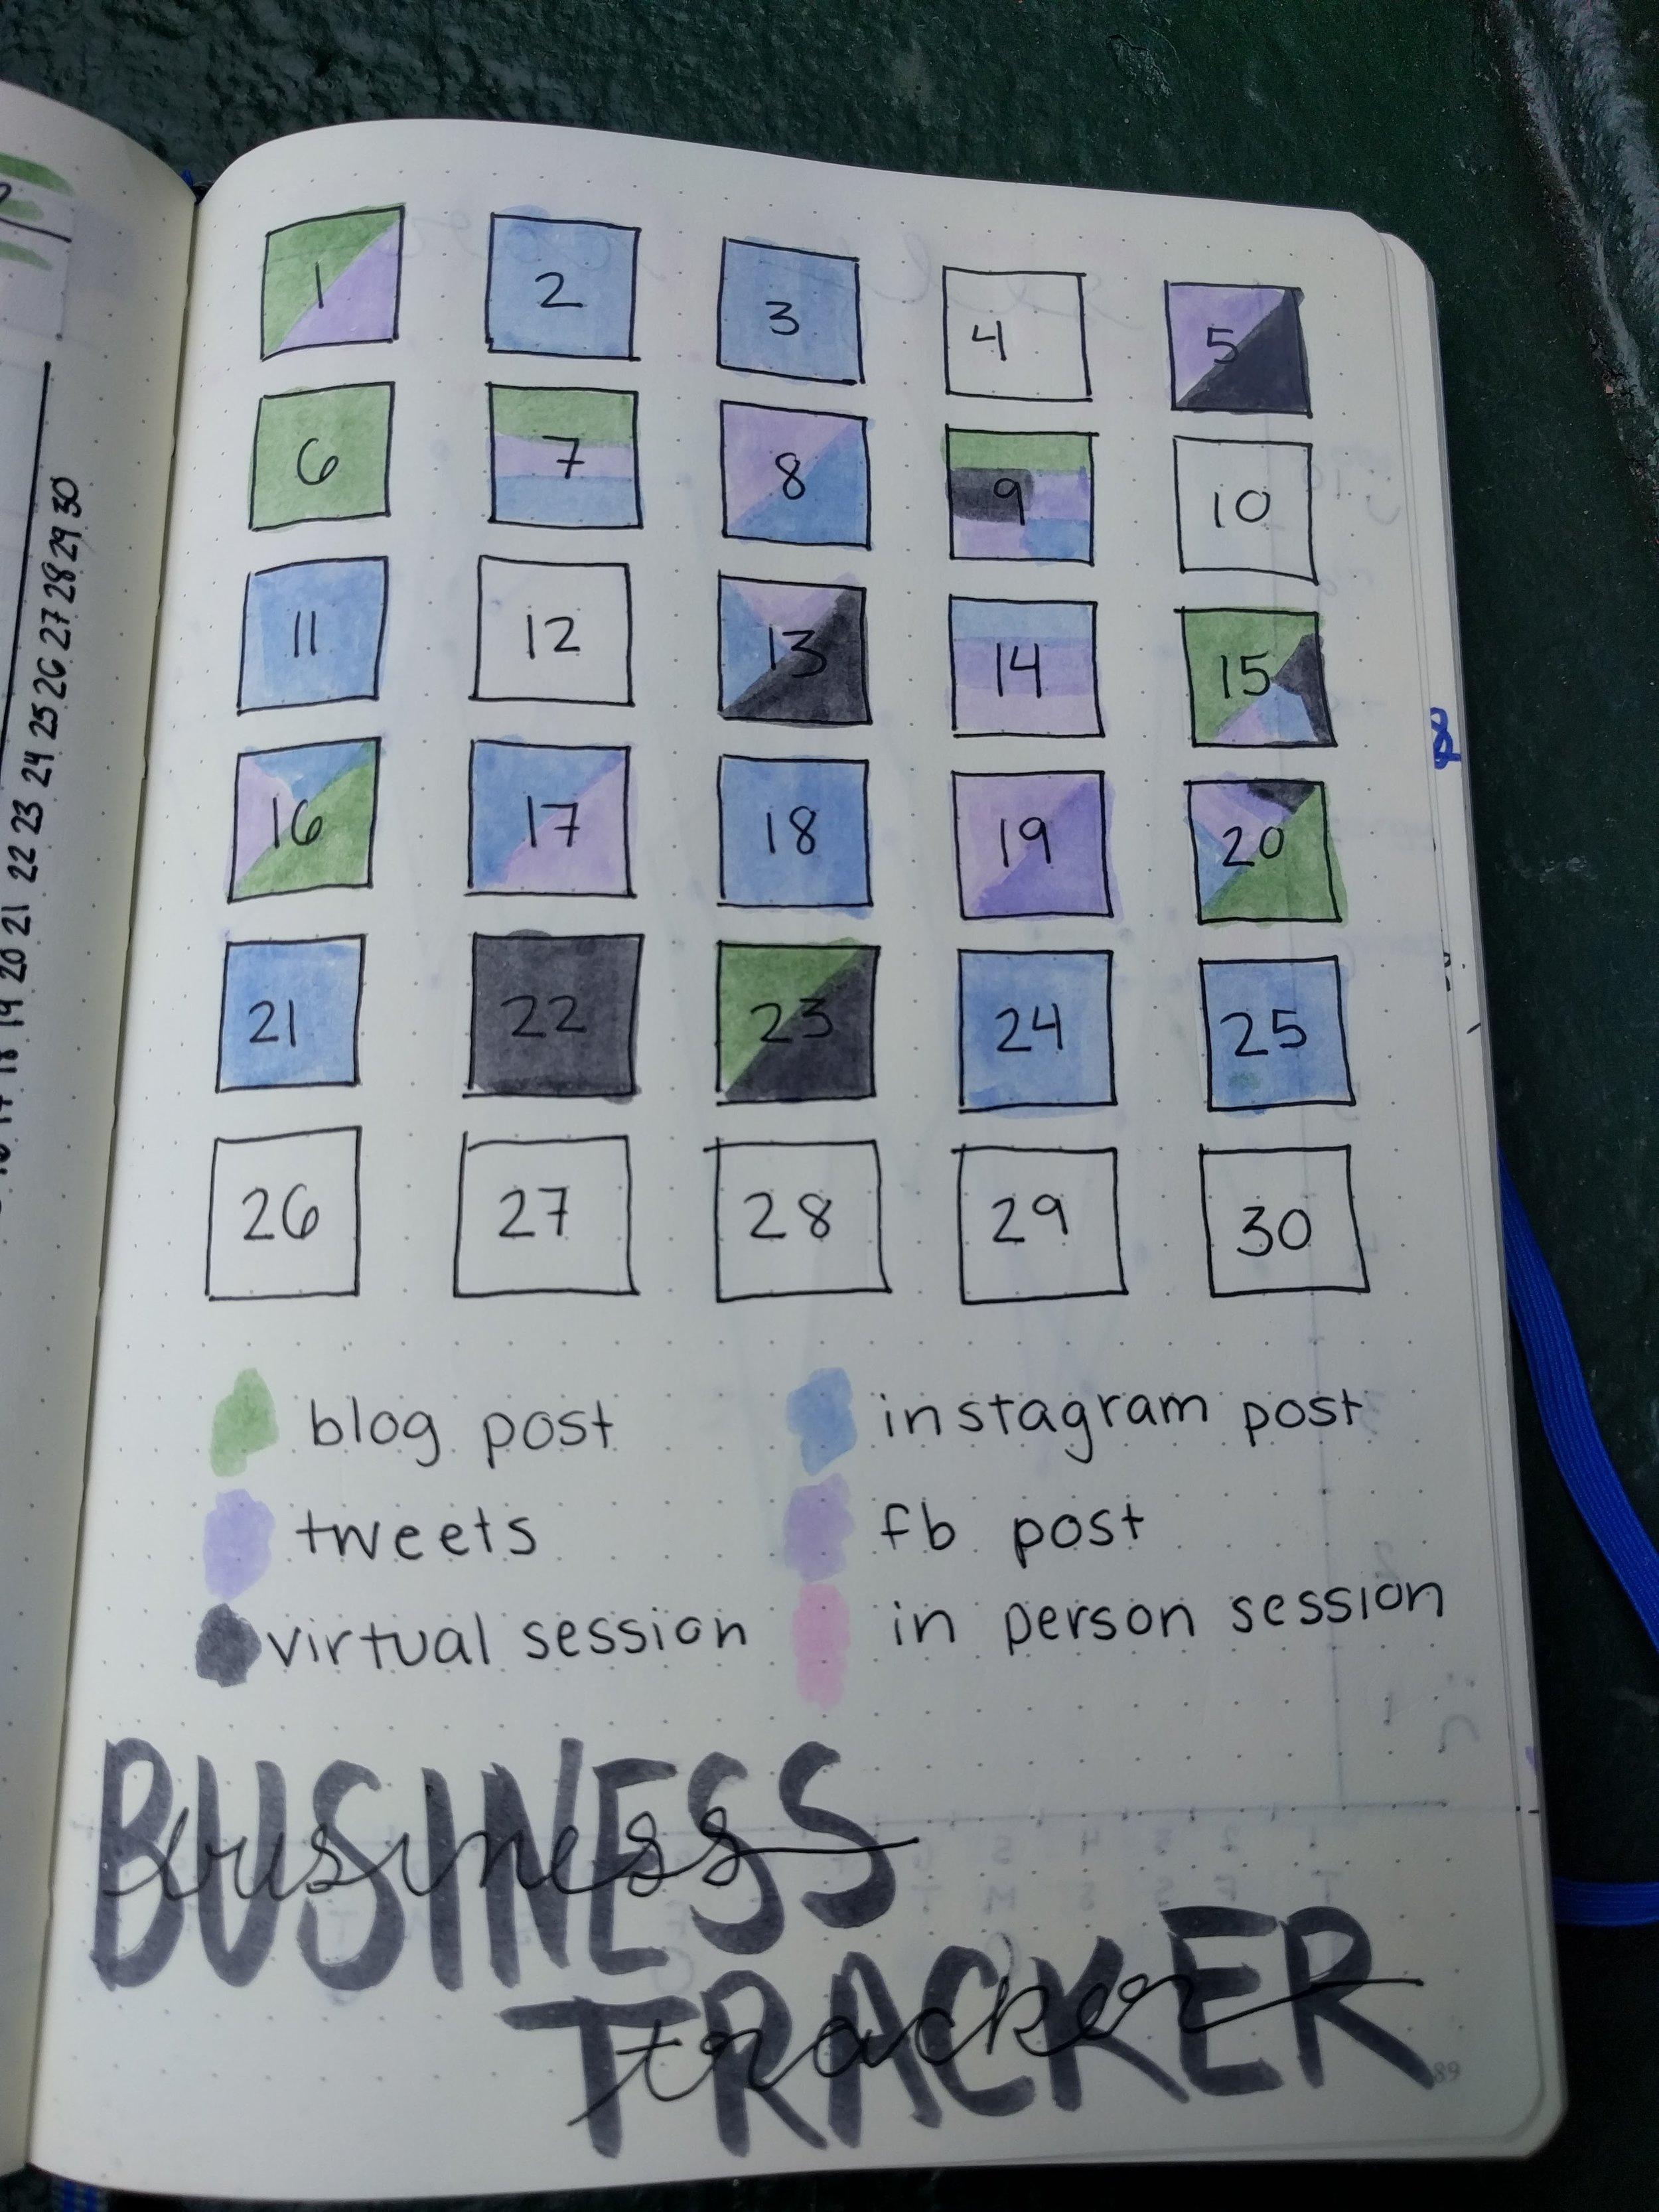 Business Tracker